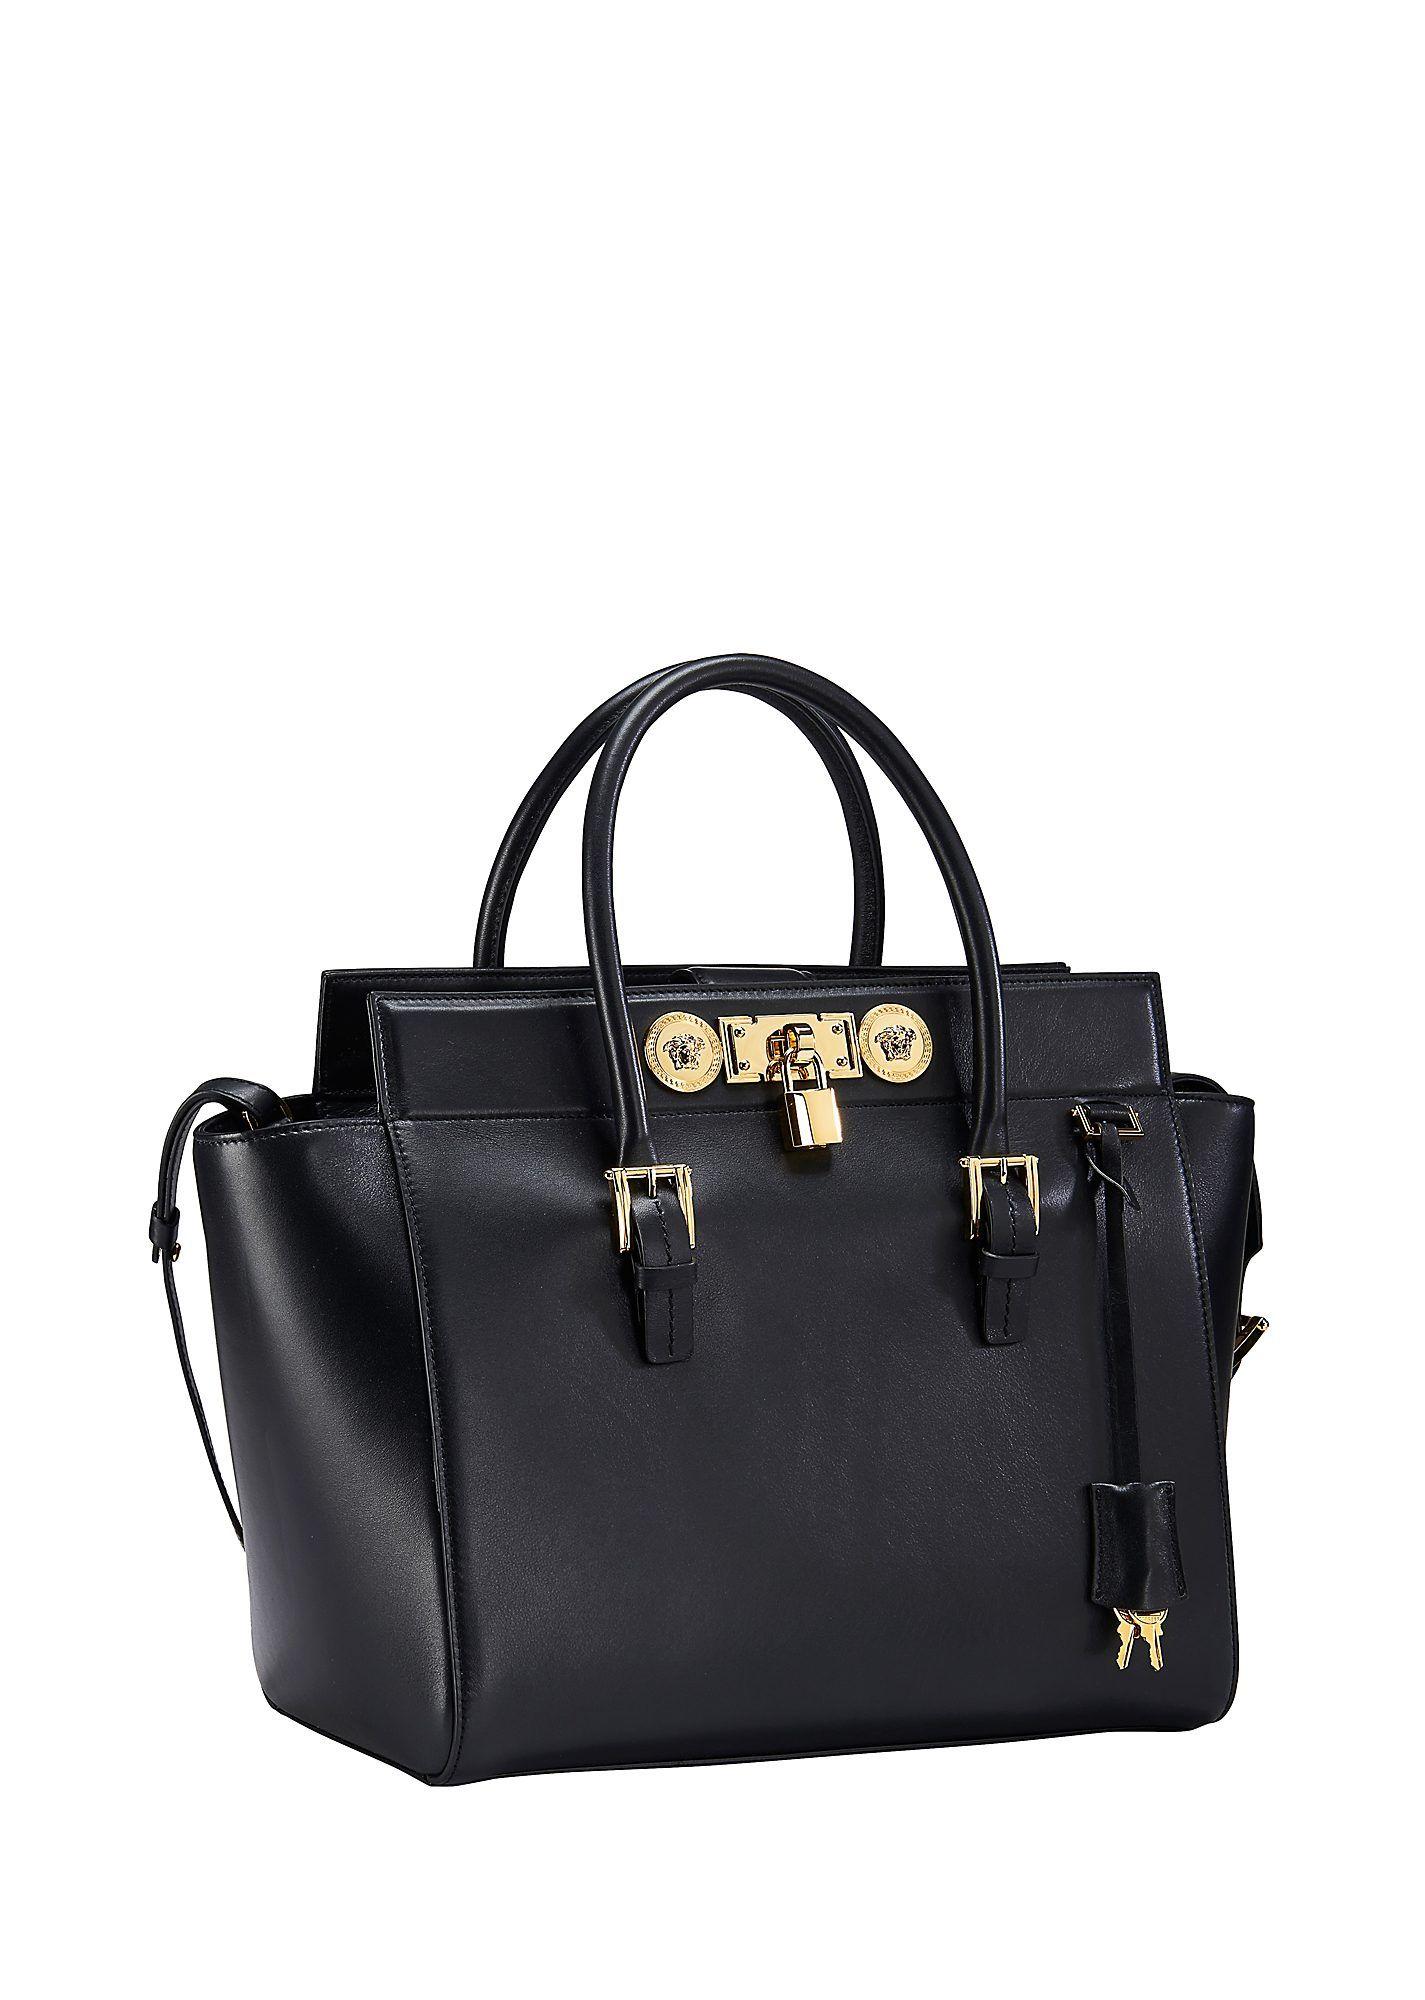 Large Signature Lock Handbag. Large Signature Lock Handbag Versace ... 5e9facd92f9a6